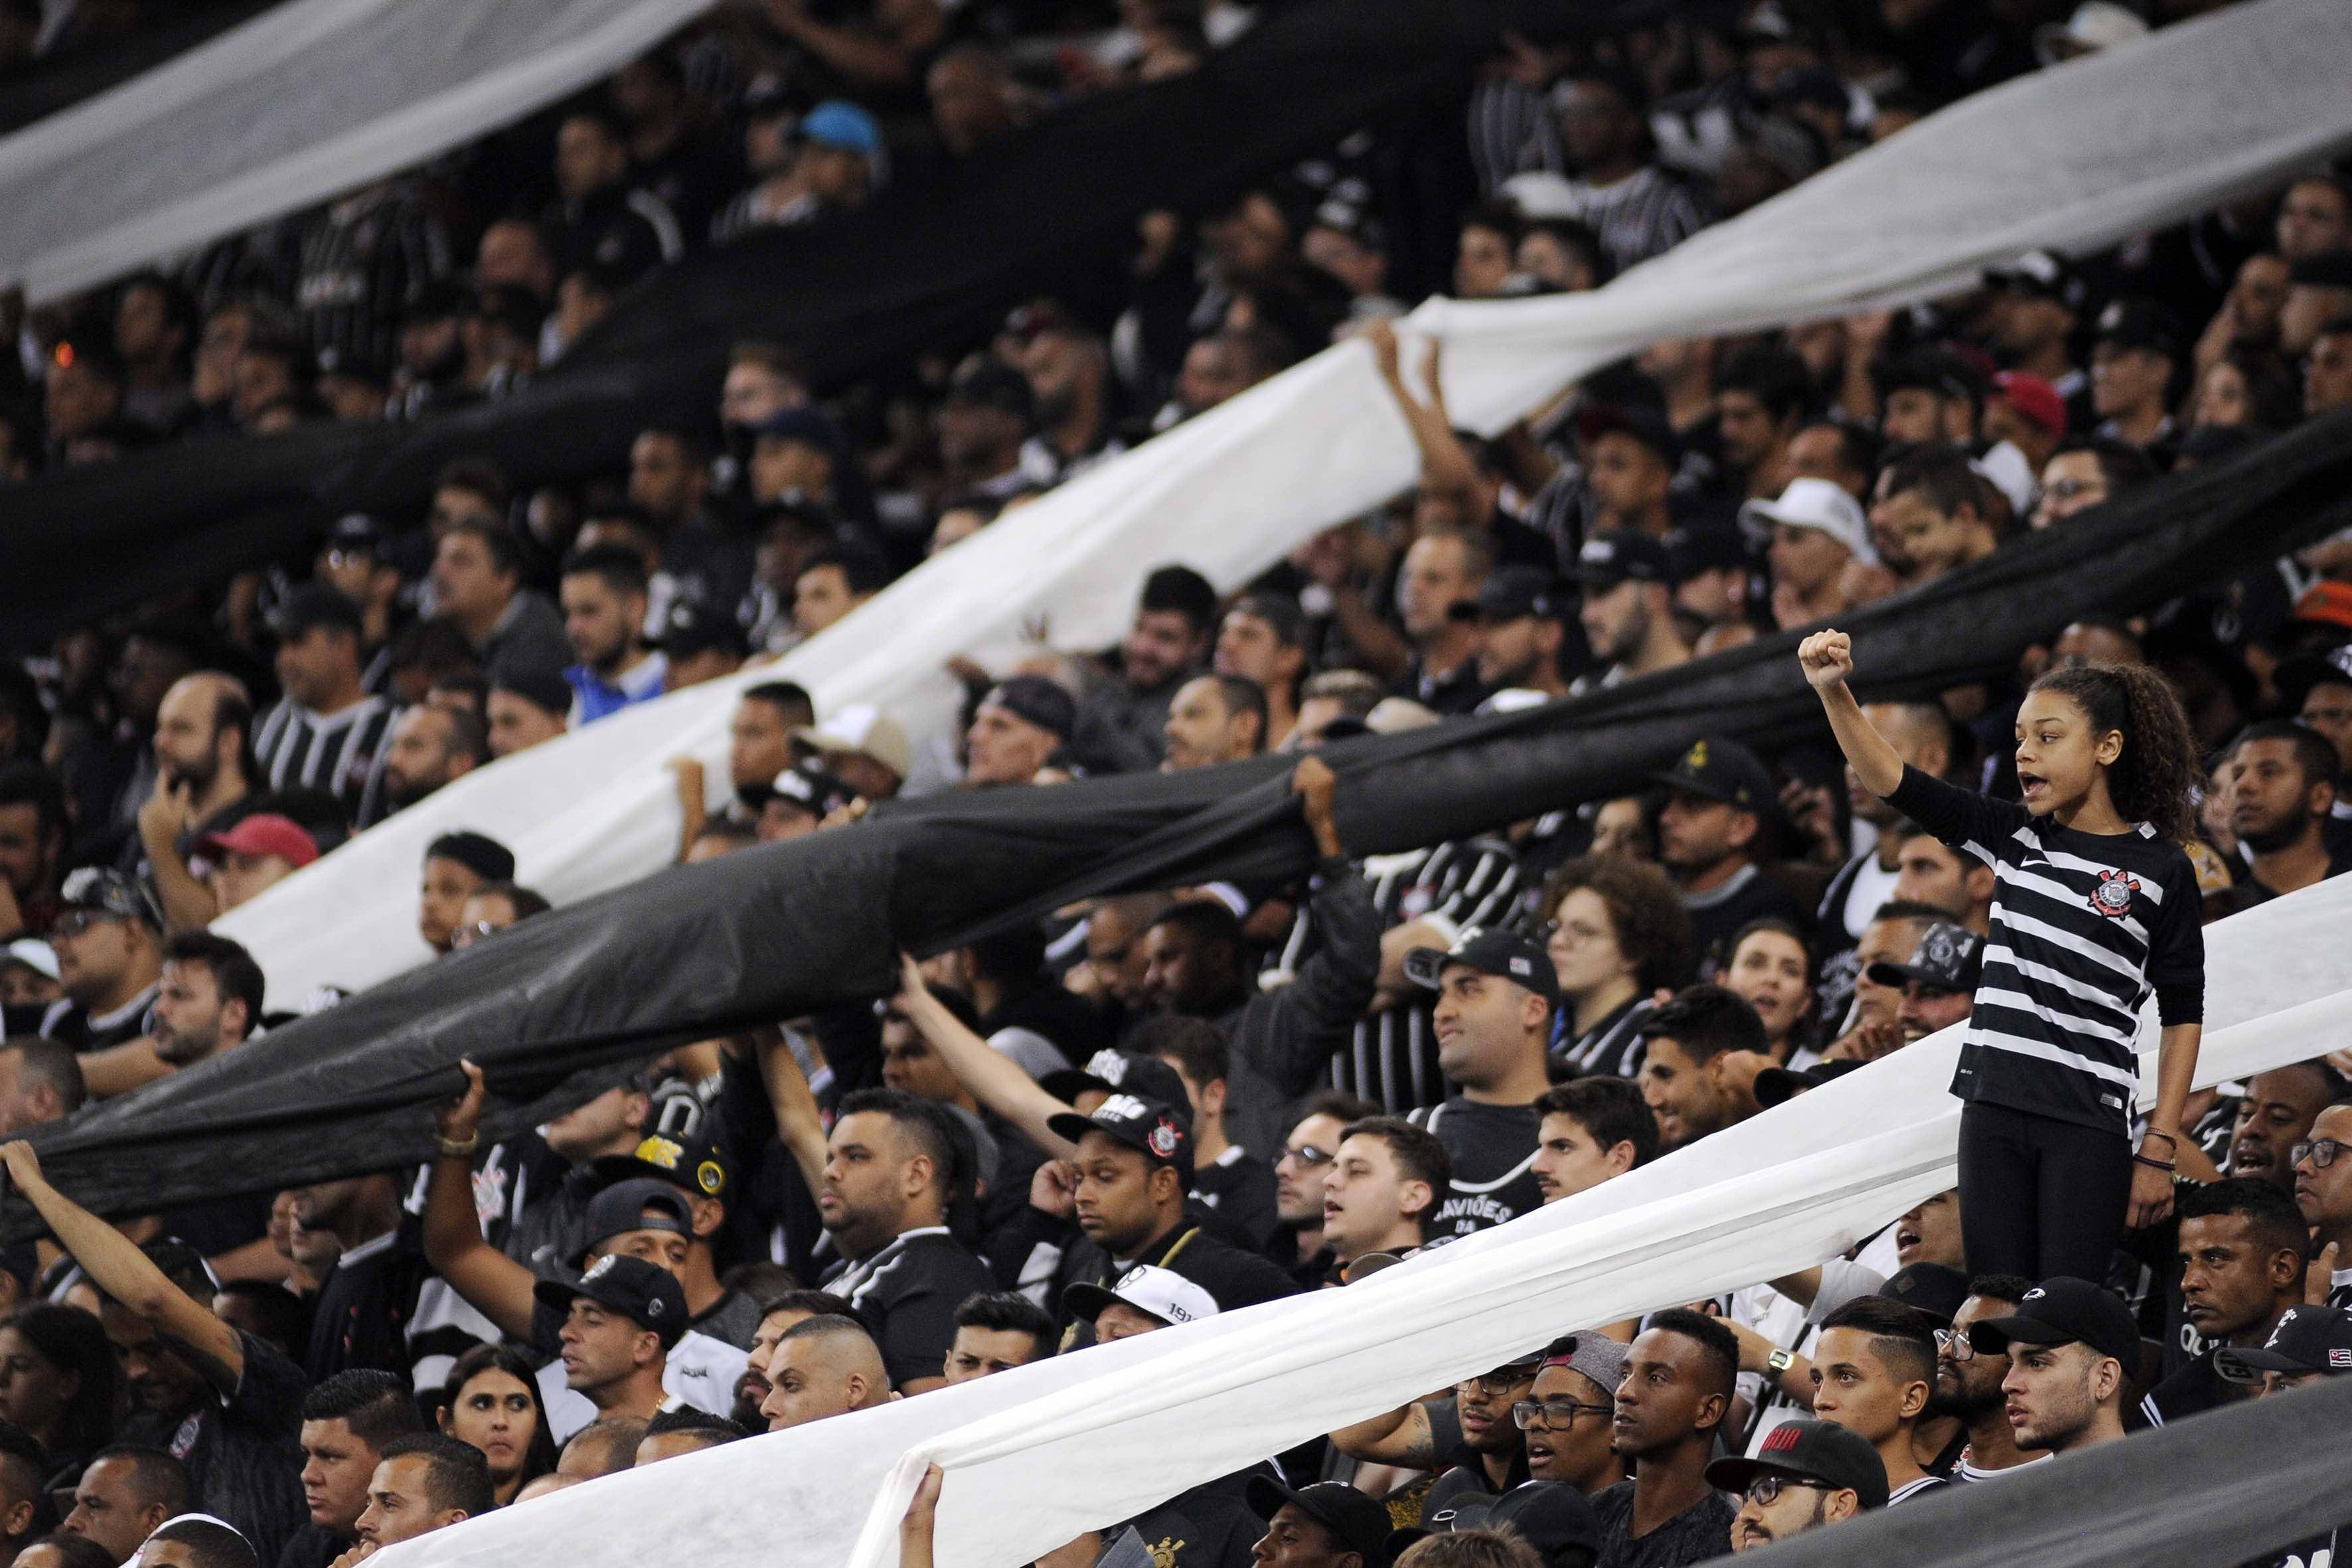 Foto da torcida do Corinthians